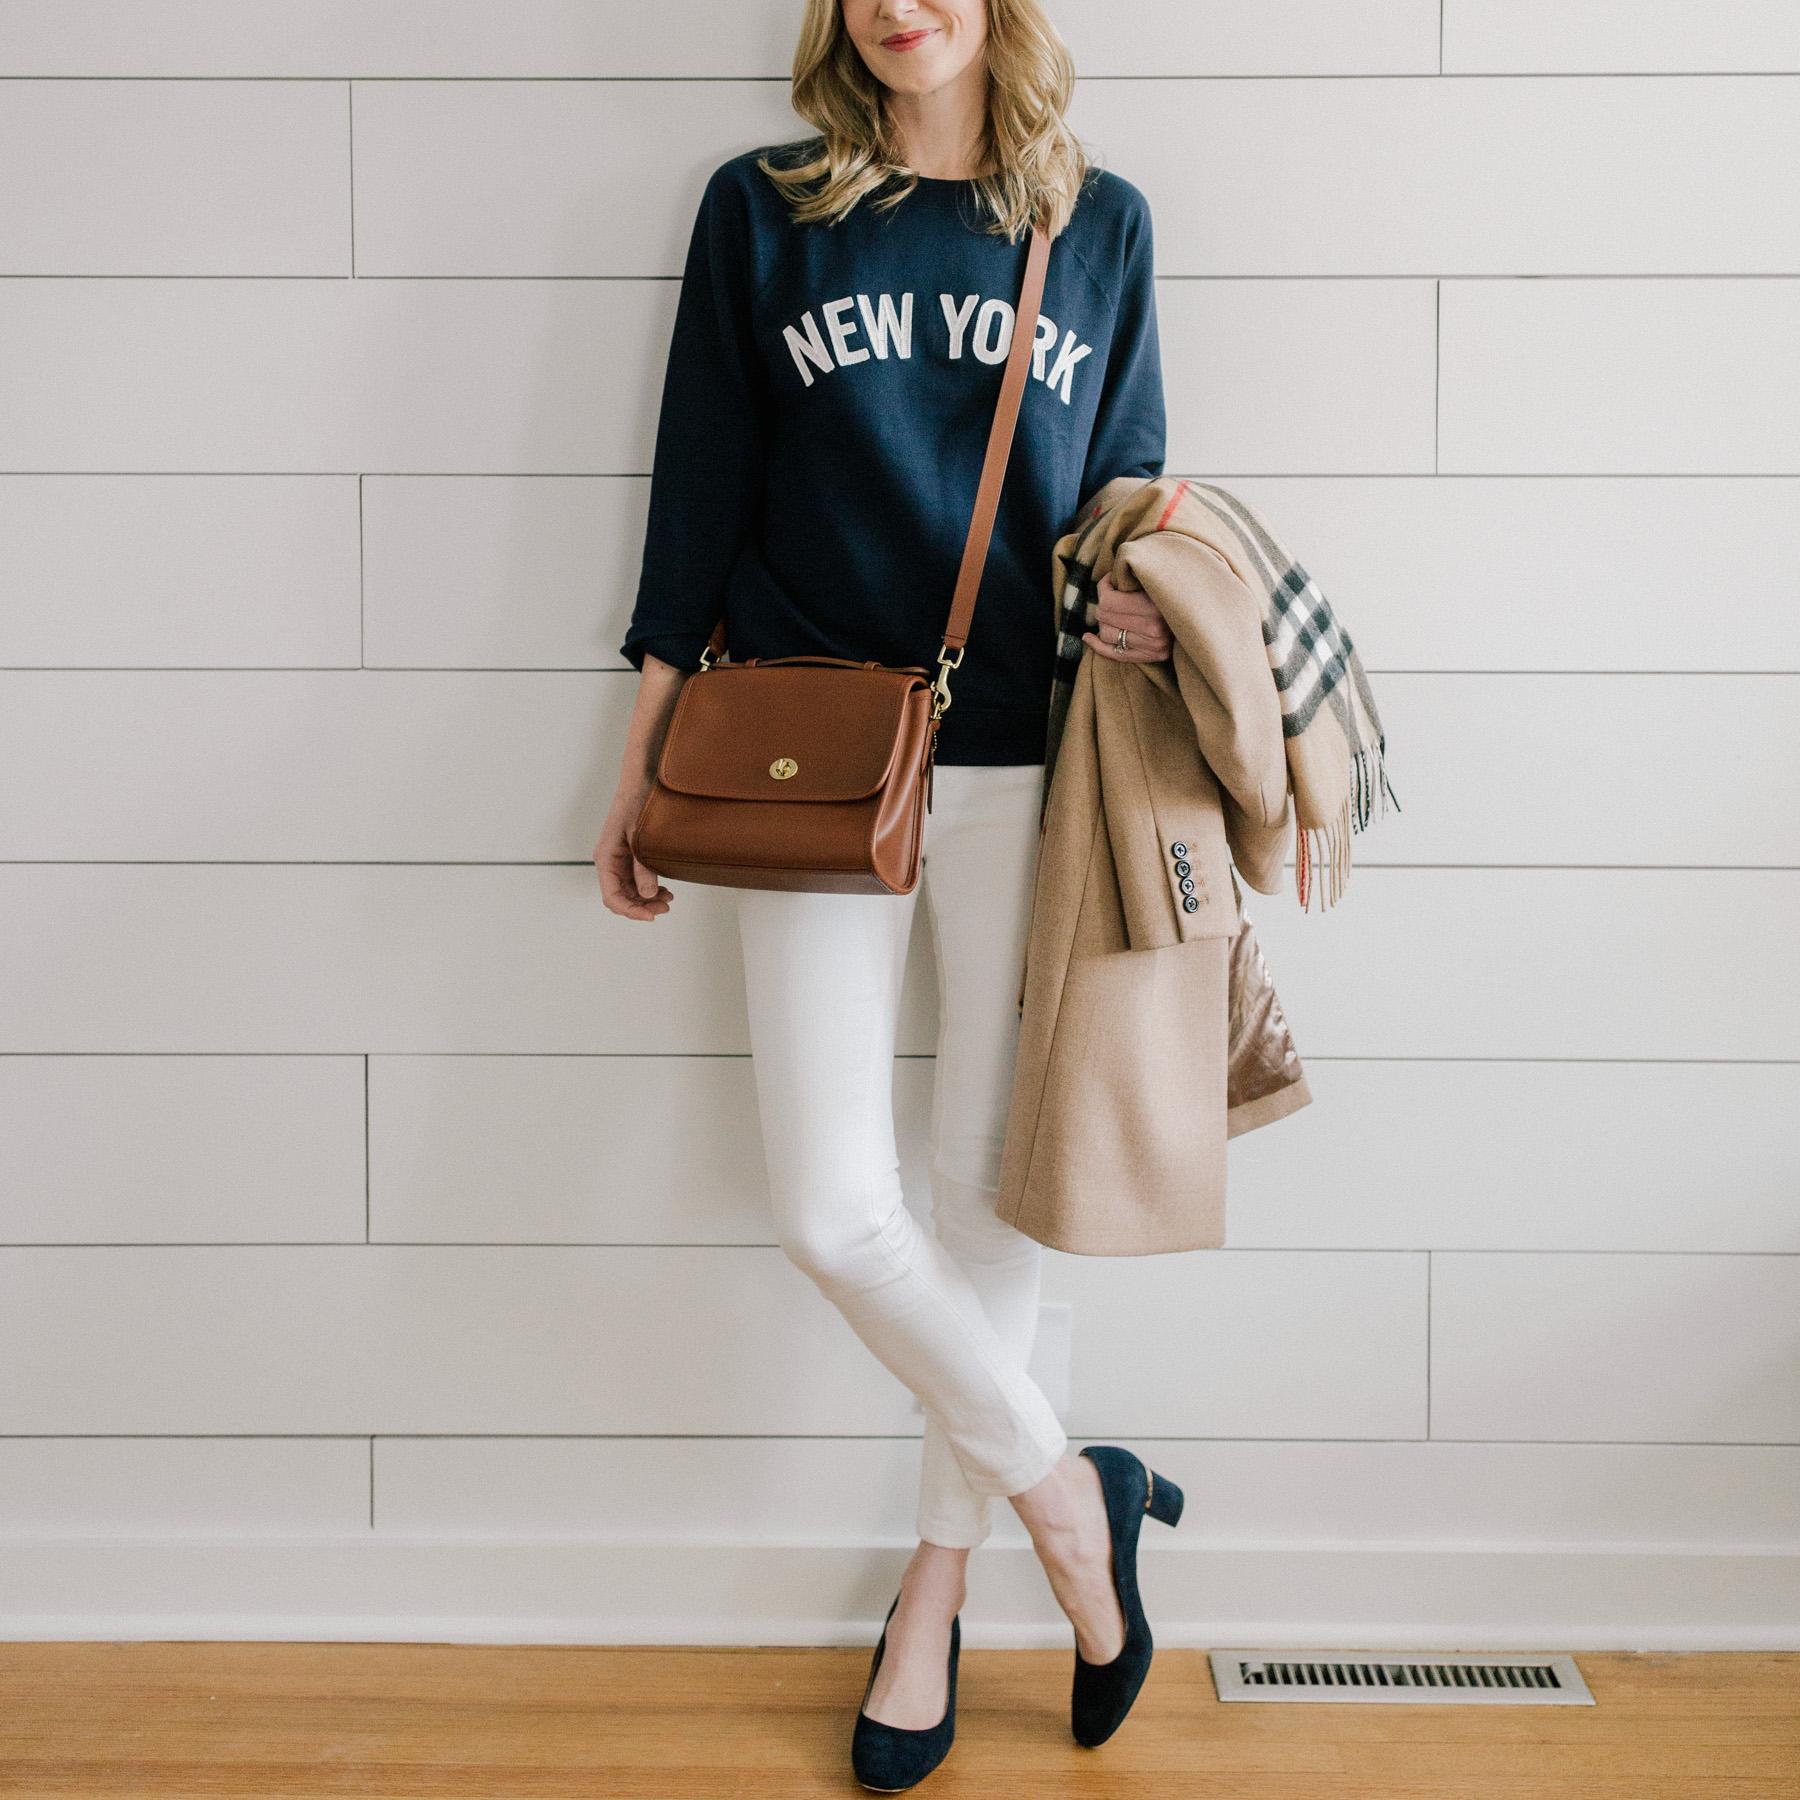 """New York"" Sweatshirt"